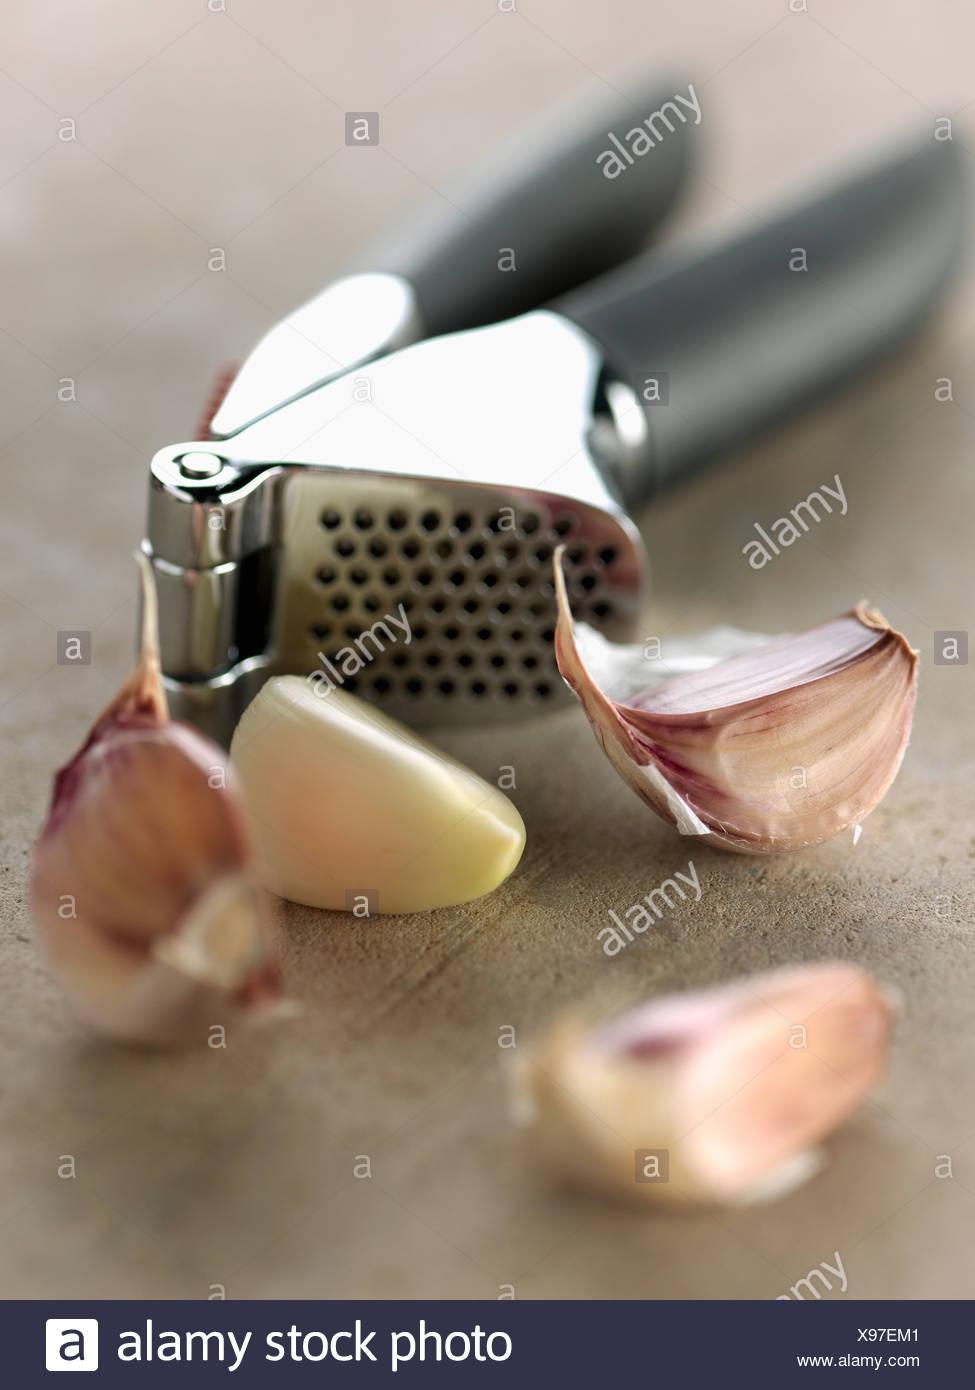 Garlic crusher - Stock Image